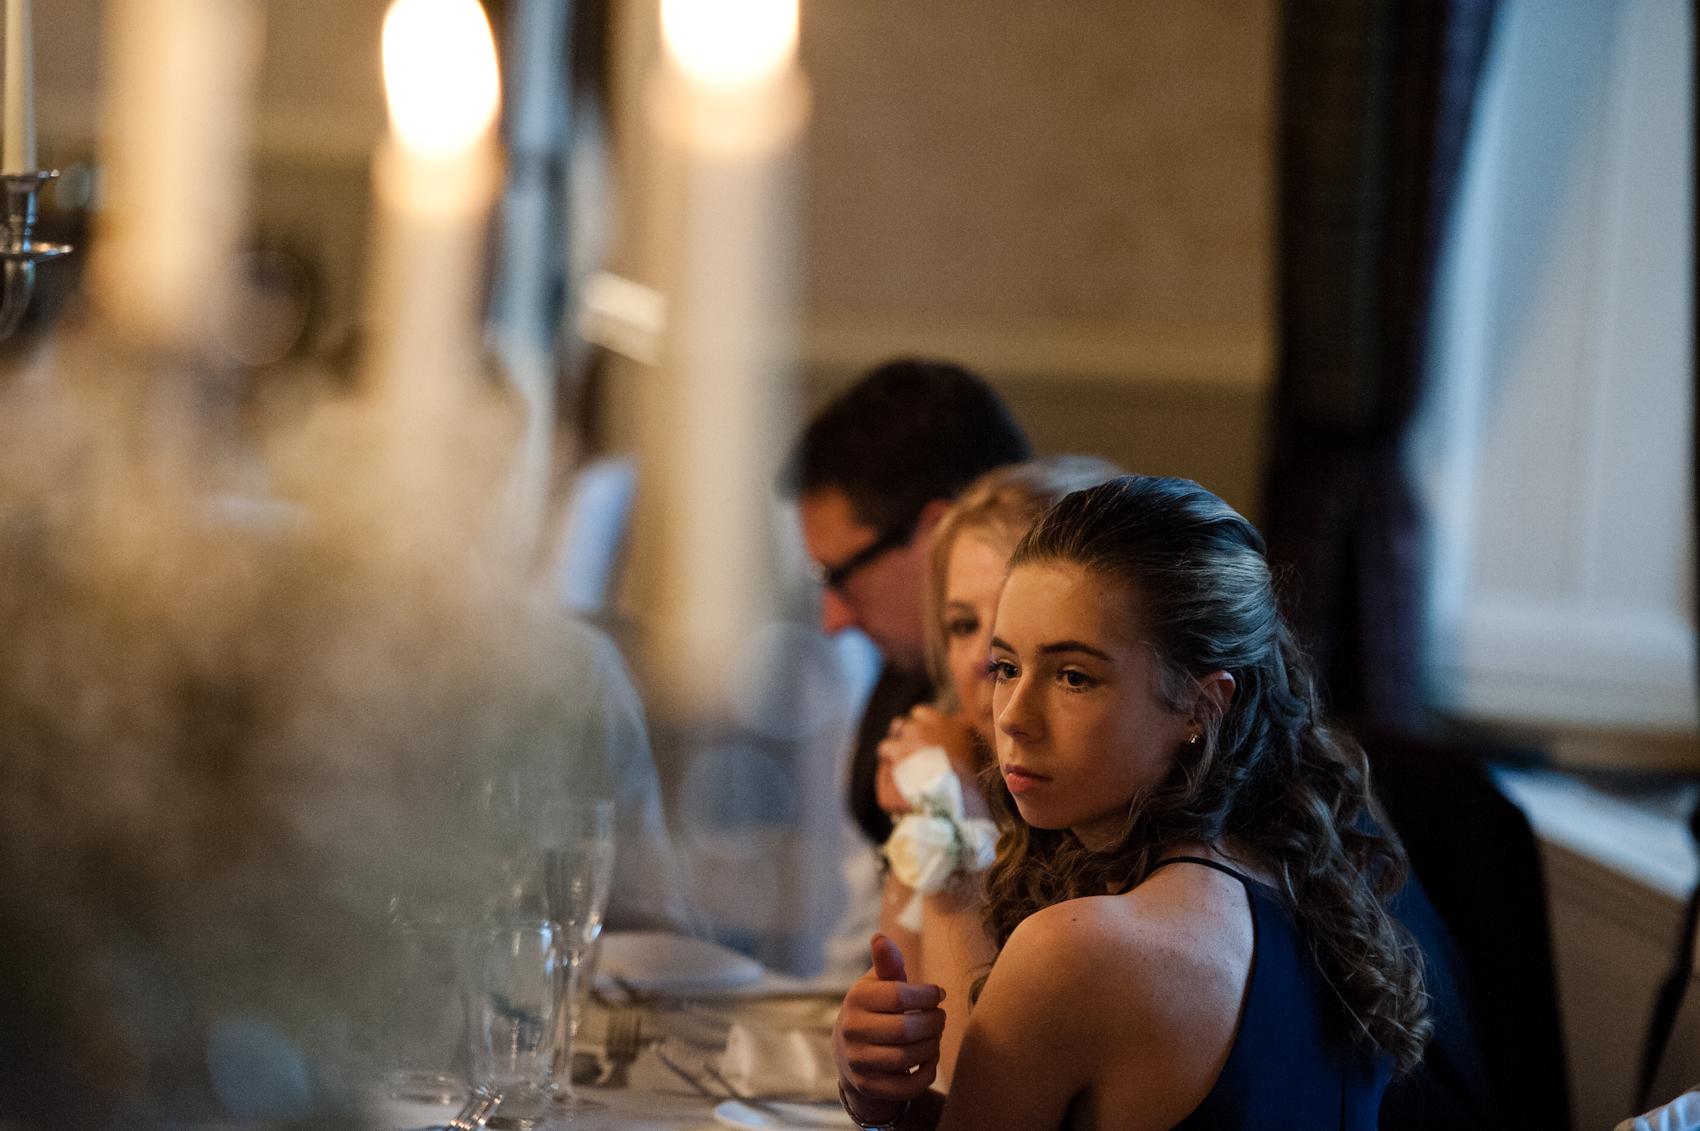 Declan & Emma wedding (21 of 29).jpg